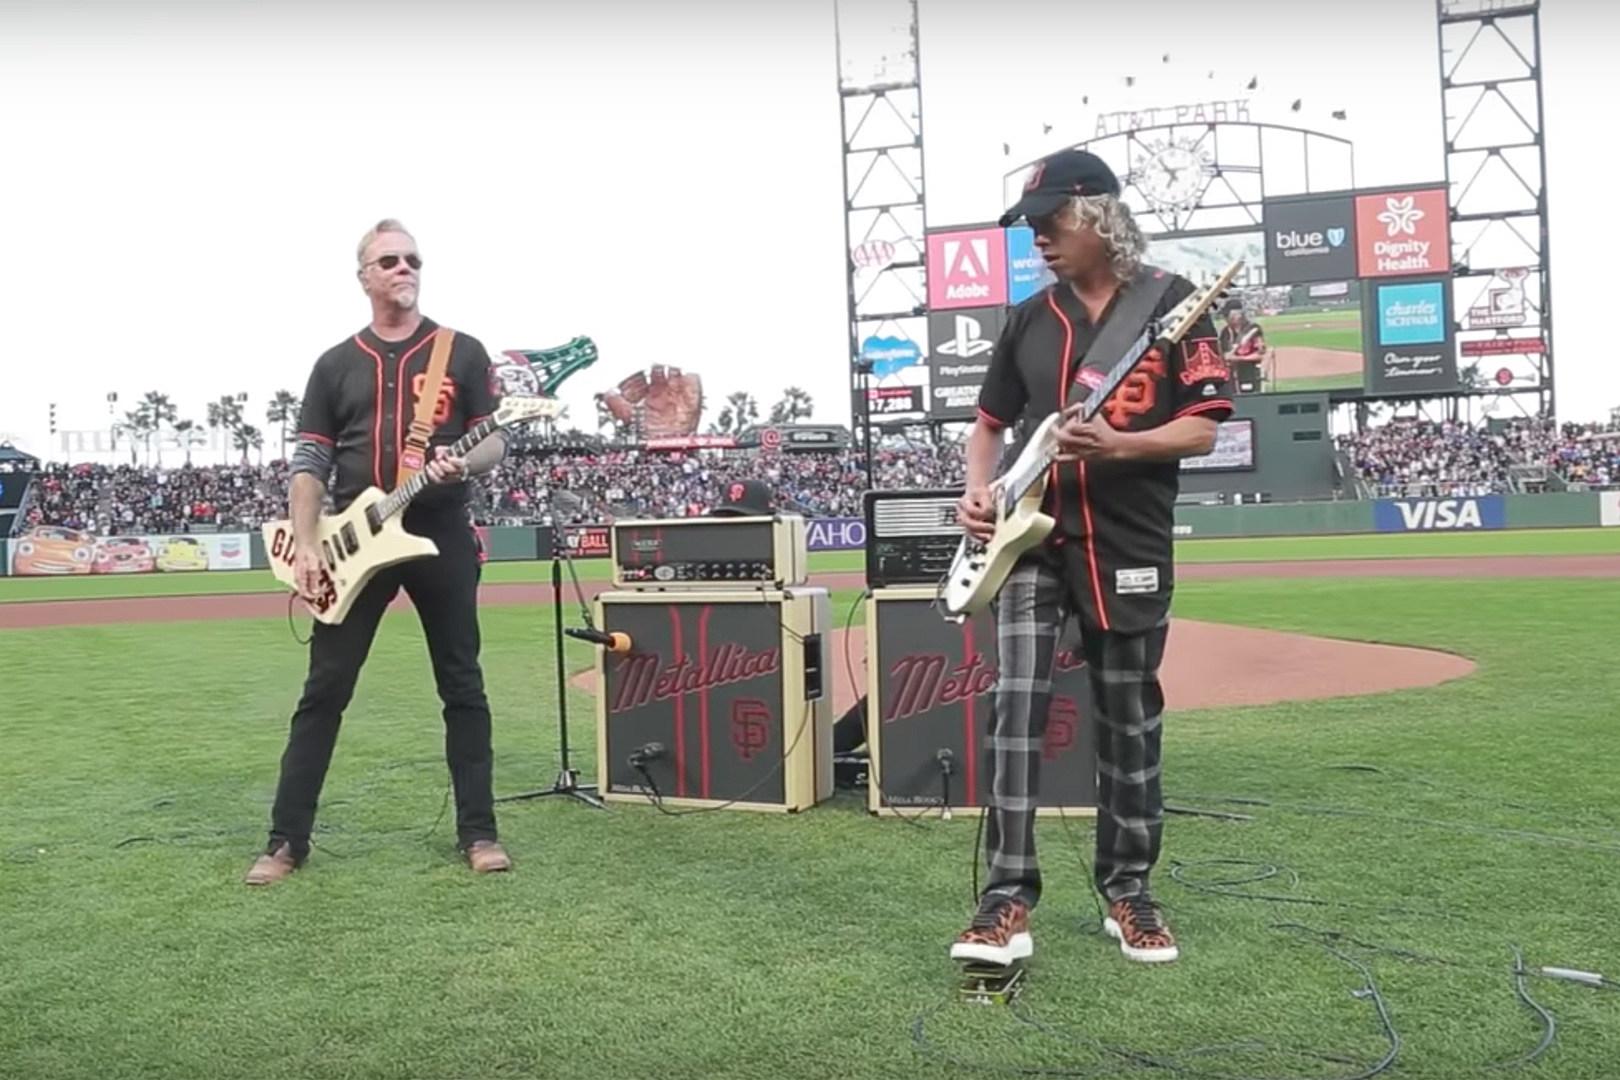 Watch Metallica Perform National Anthem at San Francisco Giants